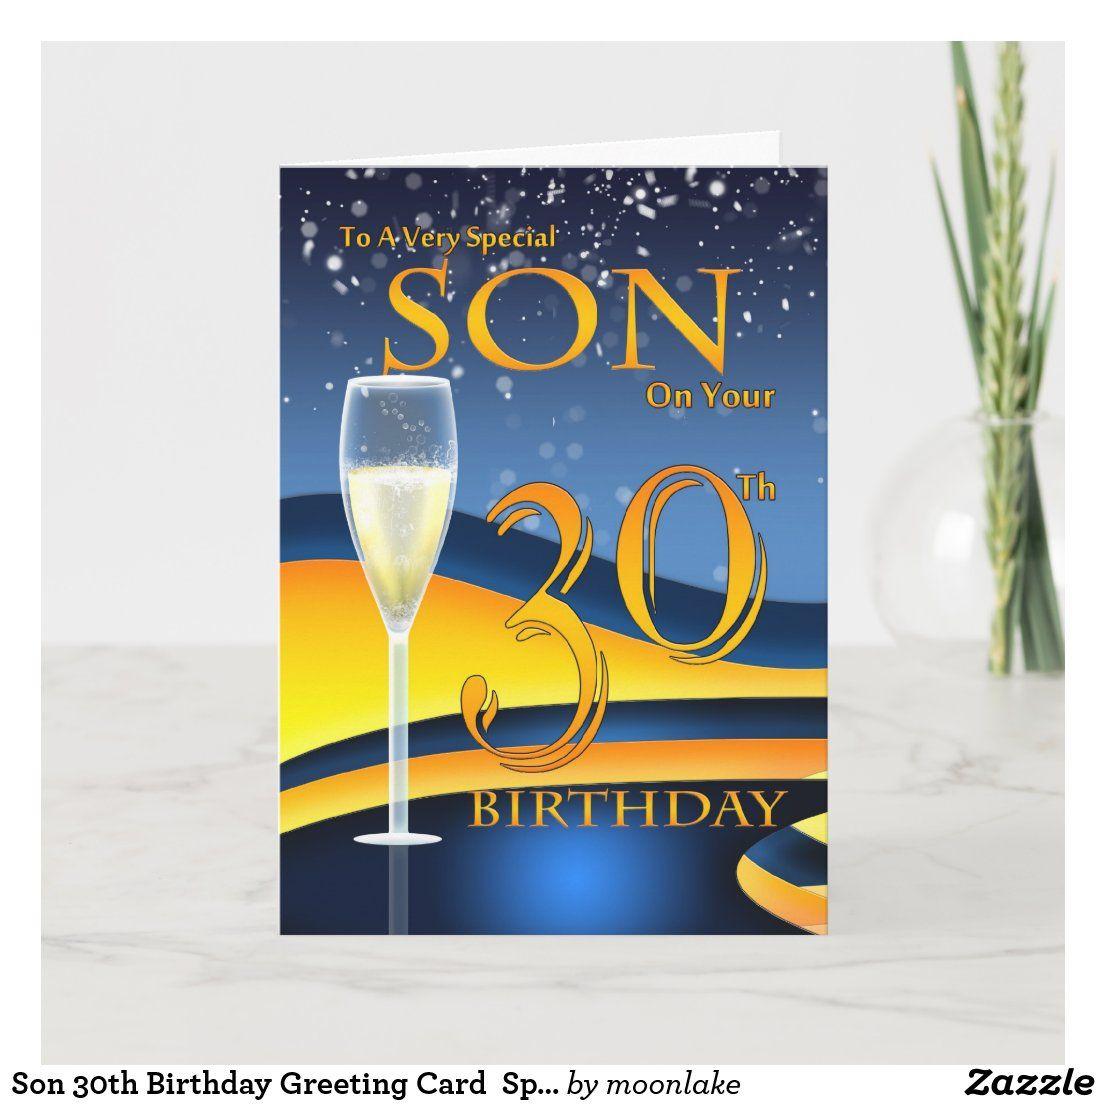 Son 30th Birthday Greeting Card Special Son Zazzle Com In 2021 30th Birthday Cards Birthday Greetings Happy Birthday Greetings